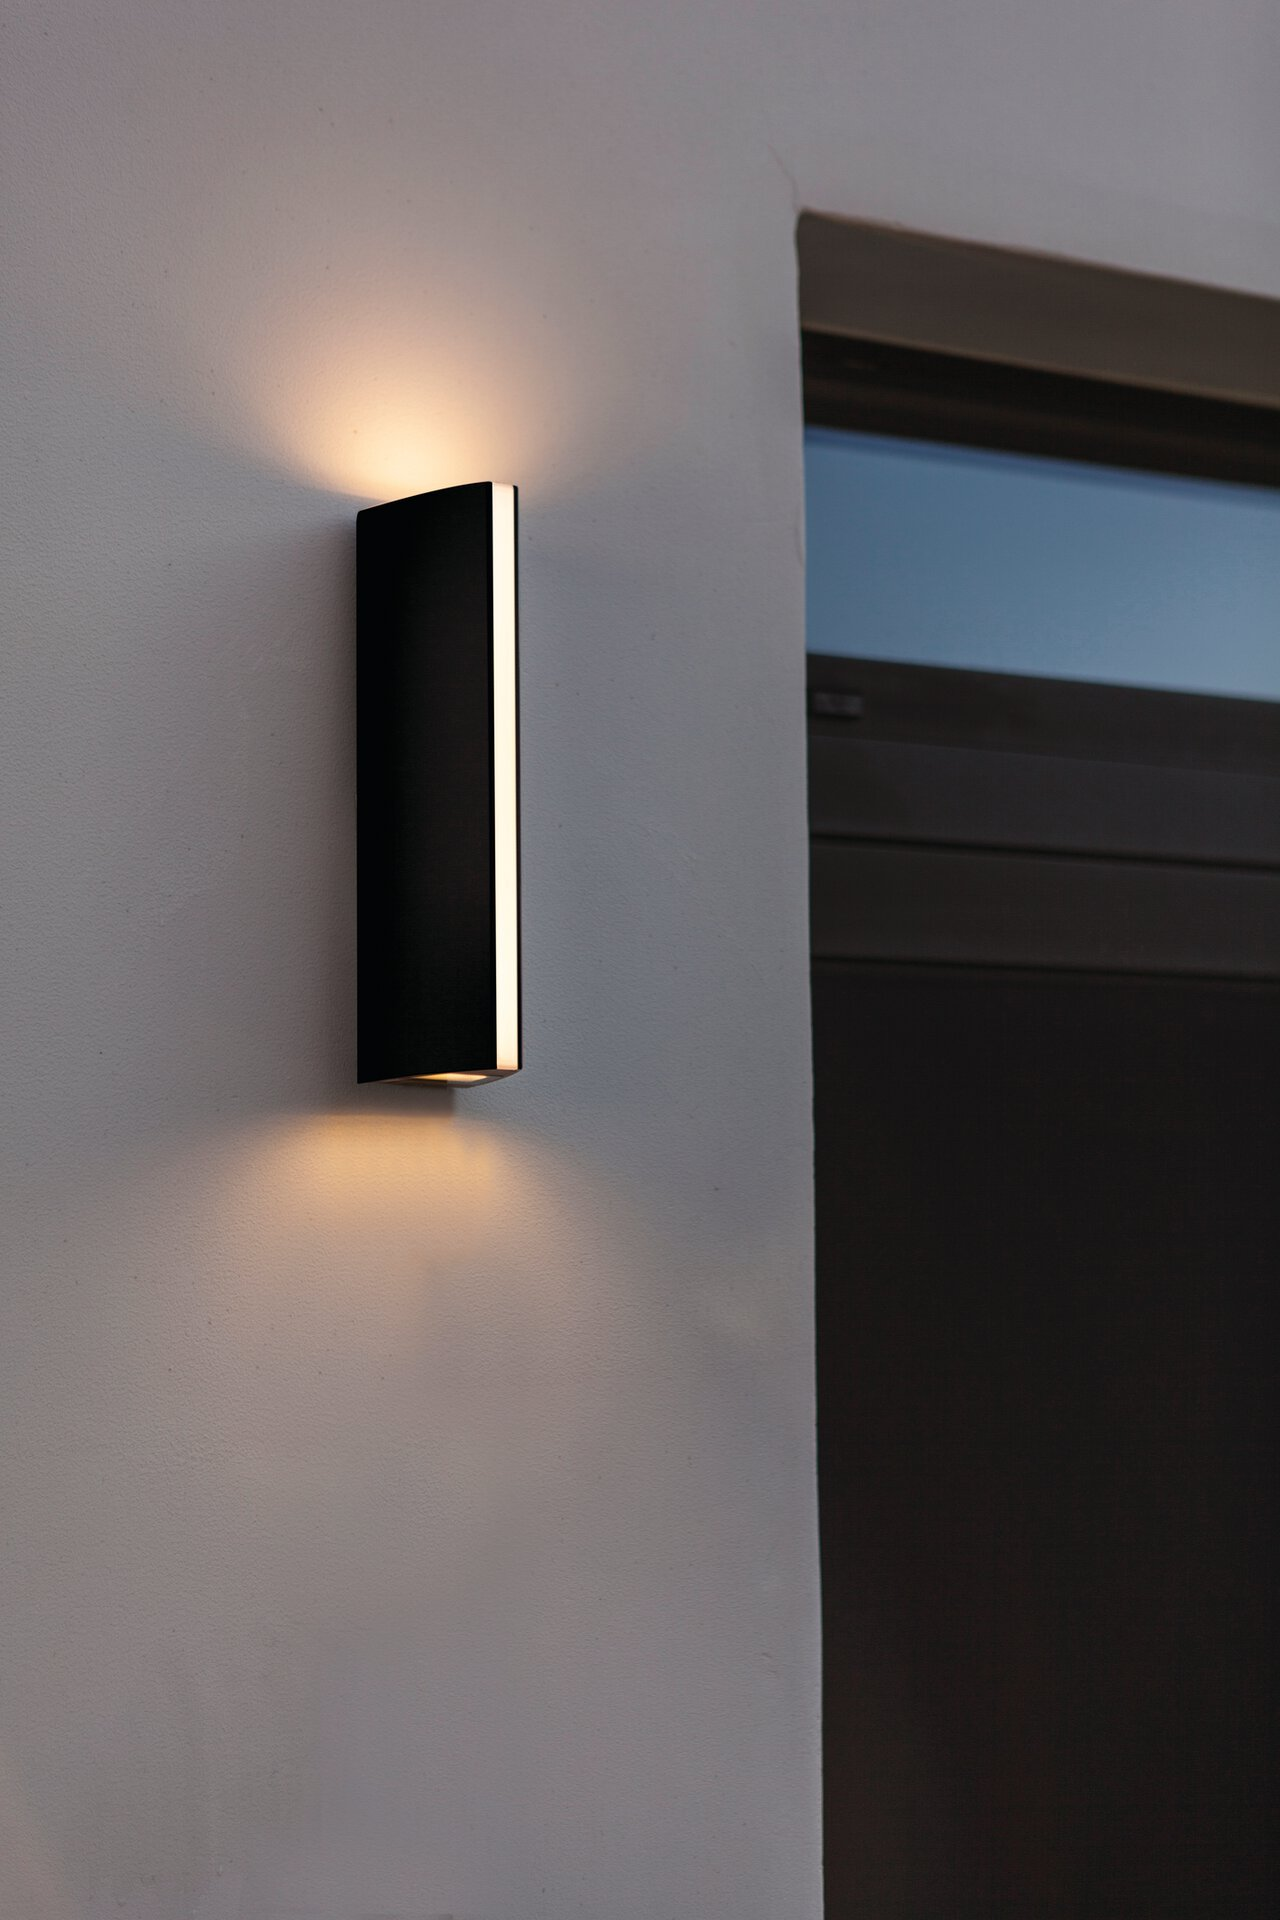 Wand-Aussenleuchte Leo Eco-Light Metall grau 7 x 30 x 9 cm